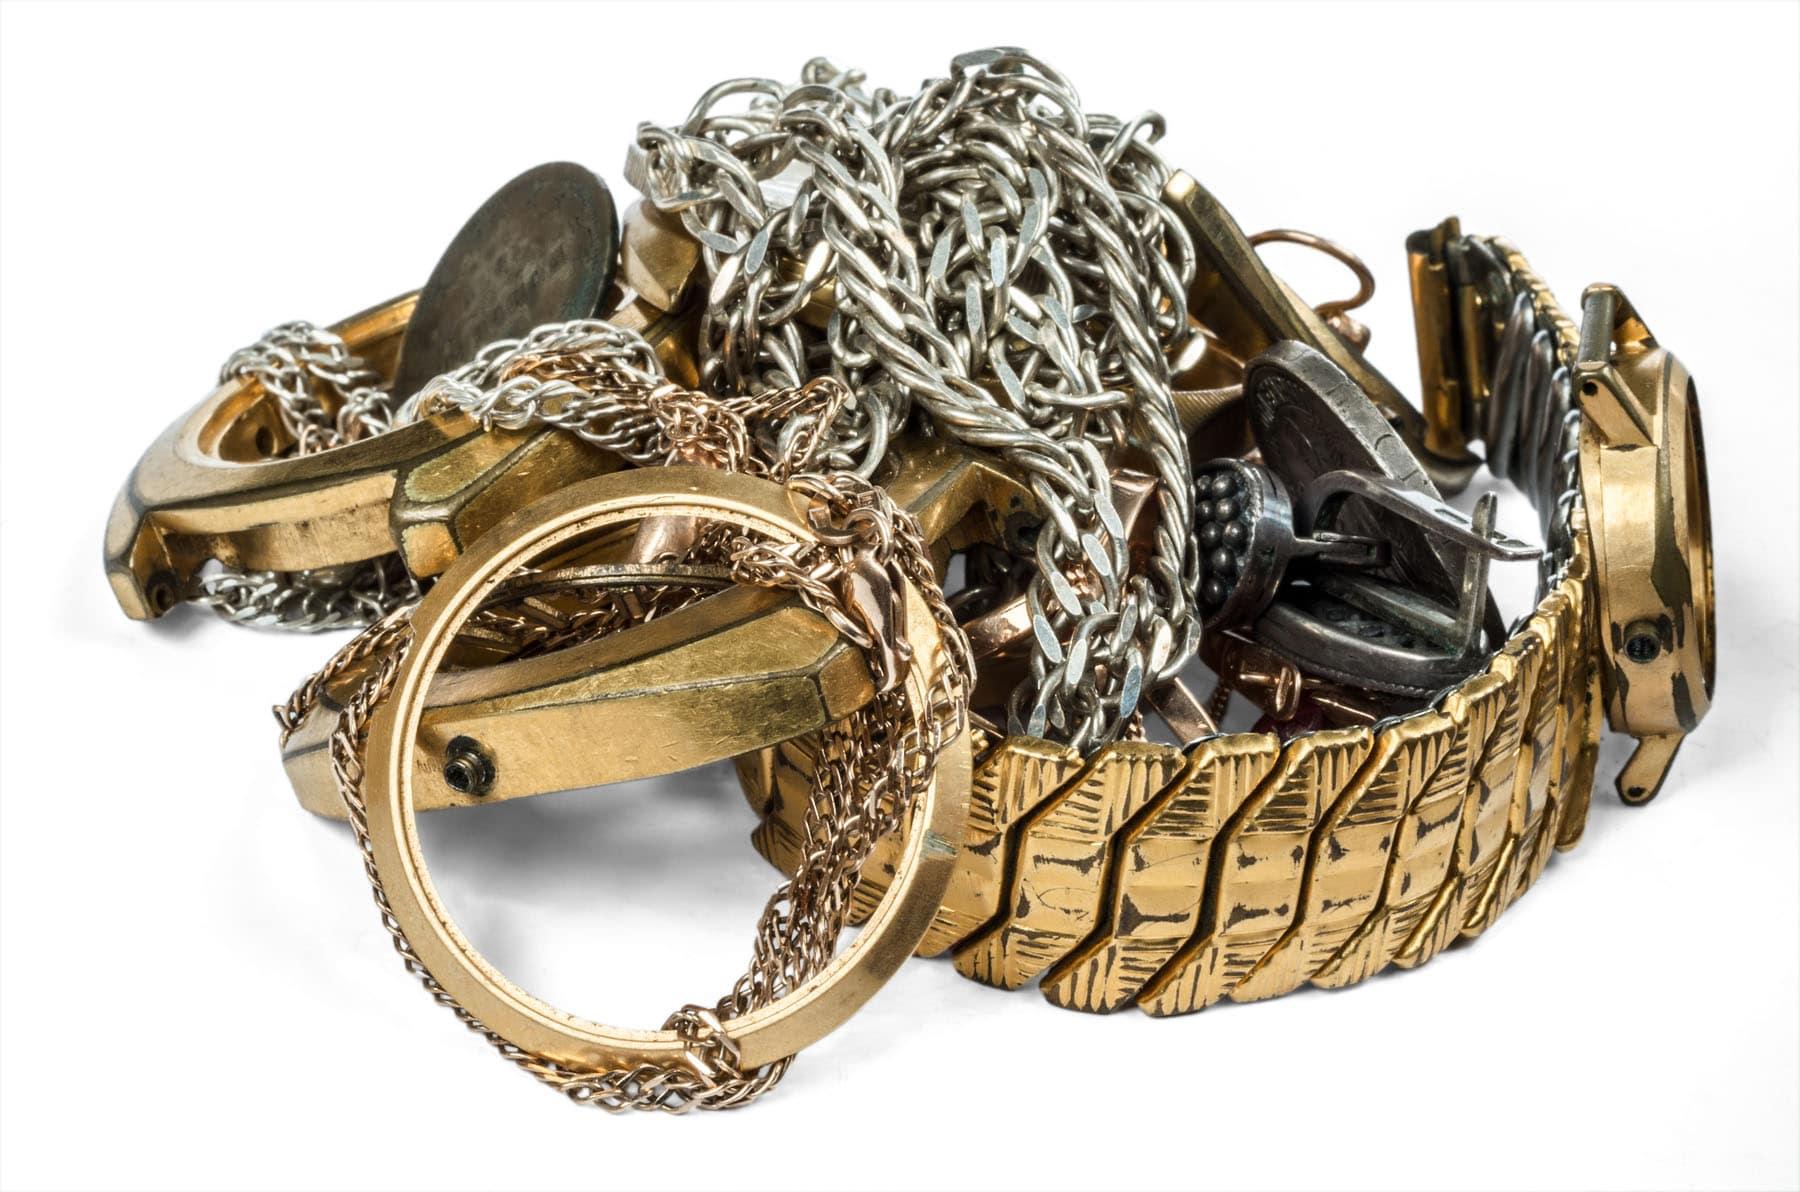 Smykker gammelt guld som kan omsmeltes til nyt